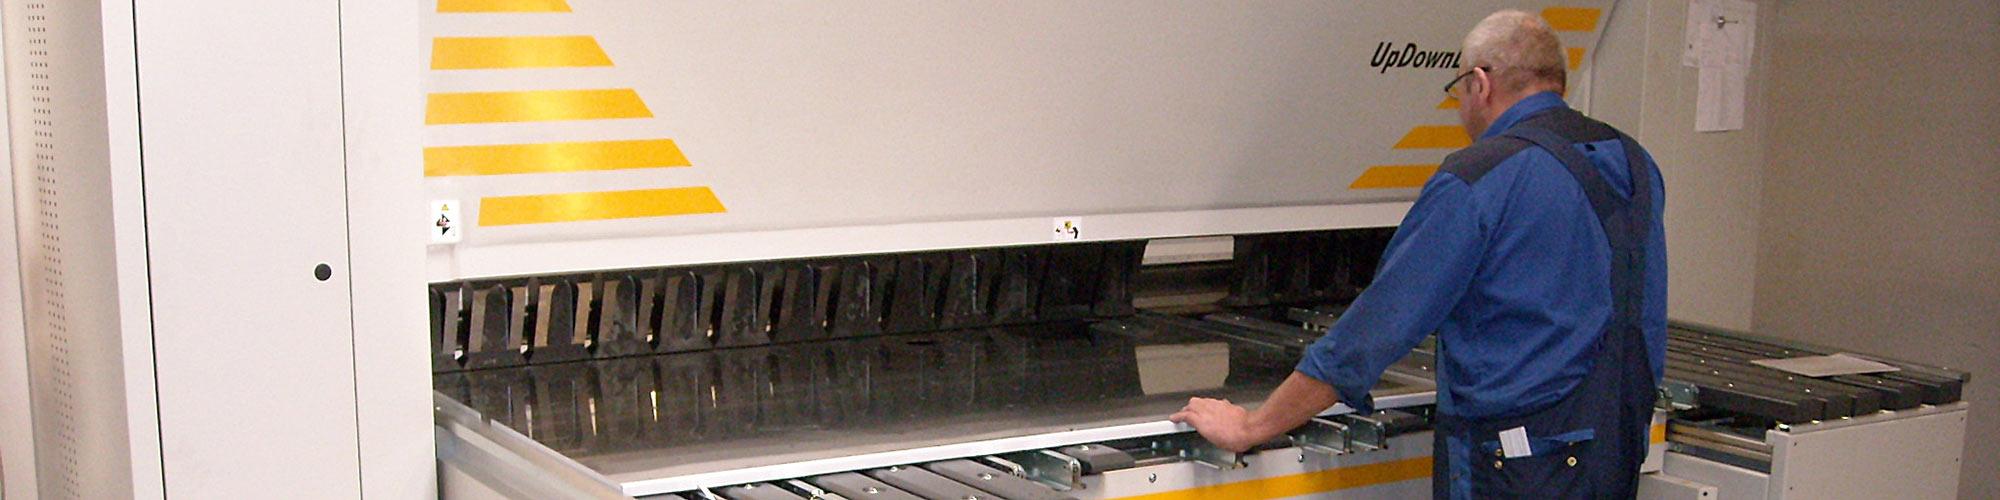 CNC pladebukning